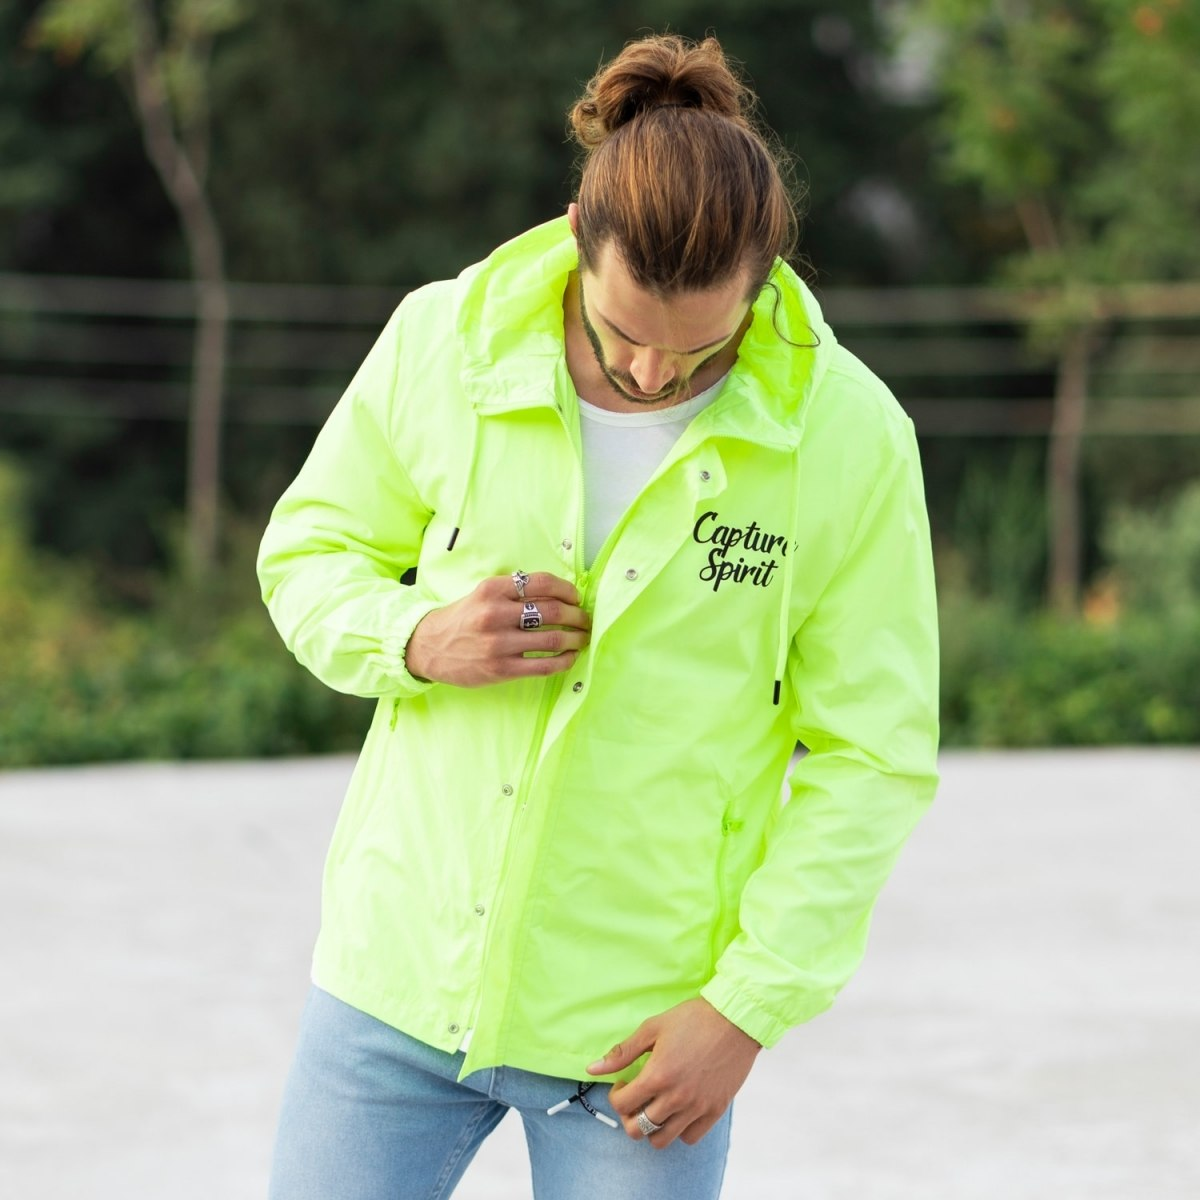 MV Autumn Collection Rainproof Hoodie in Neon-Green